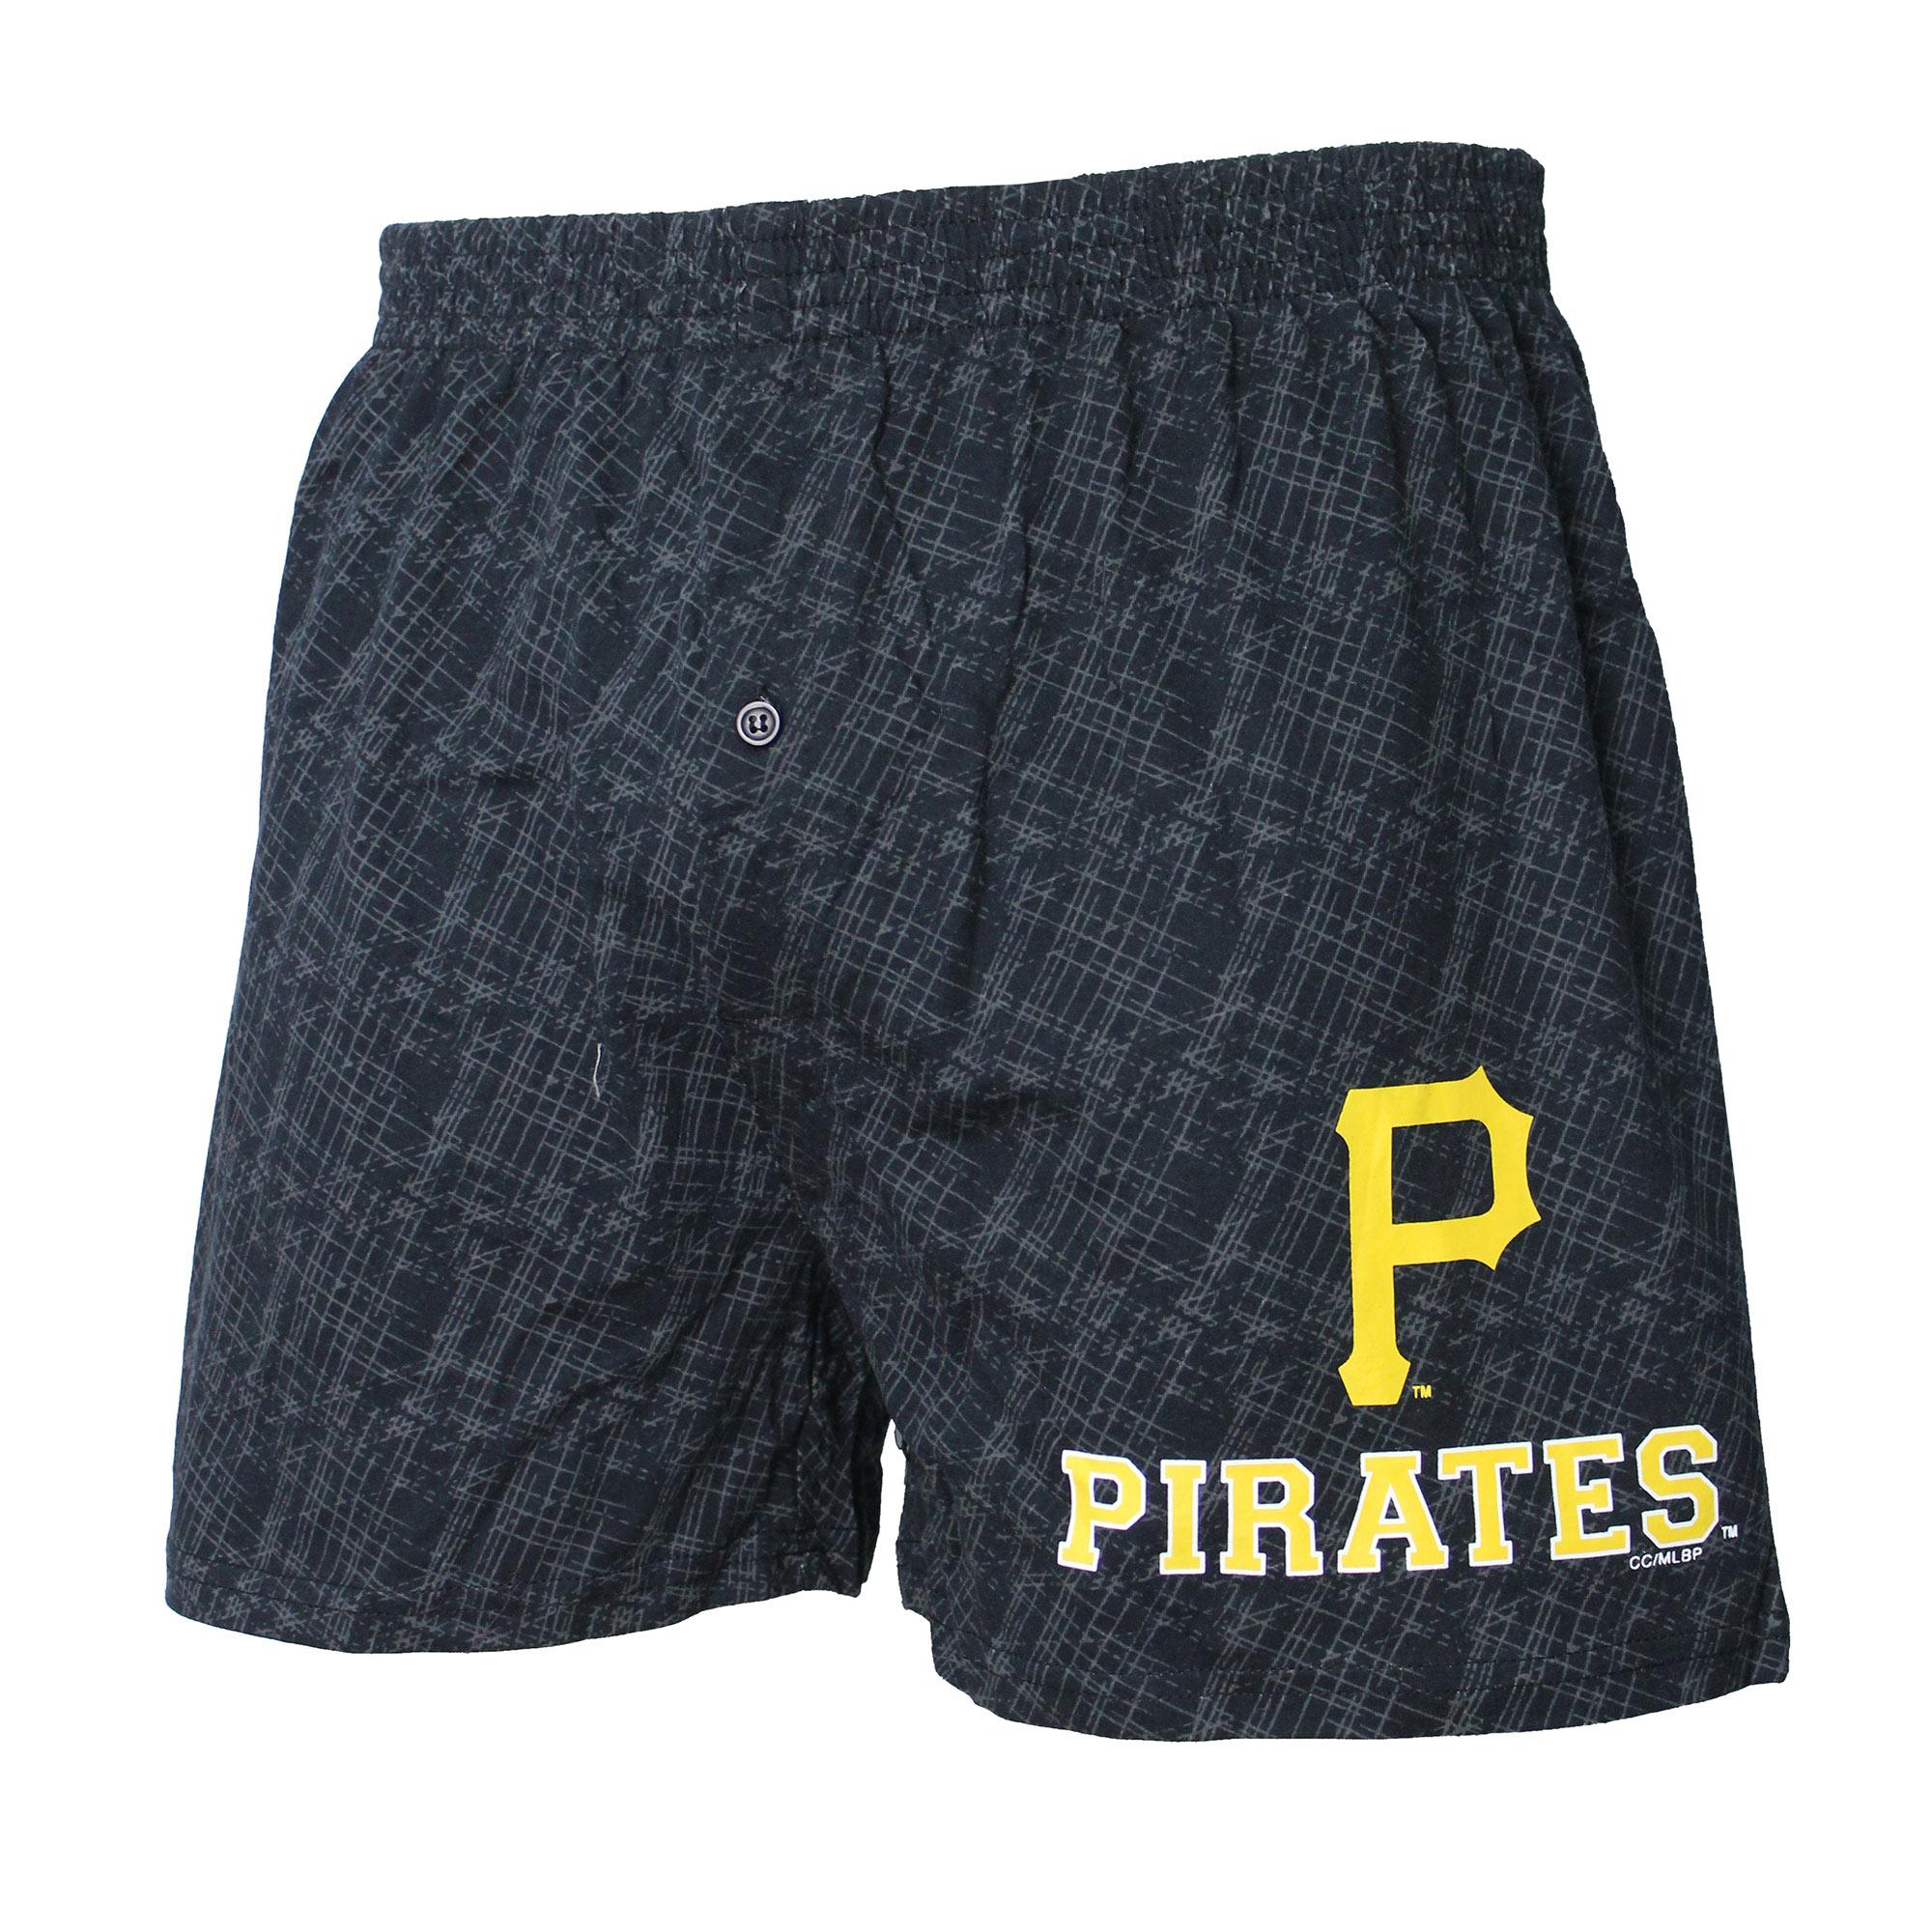 Pittsburgh Pirates Concepts Sport Showdown Knit Boxer Shorts - Black